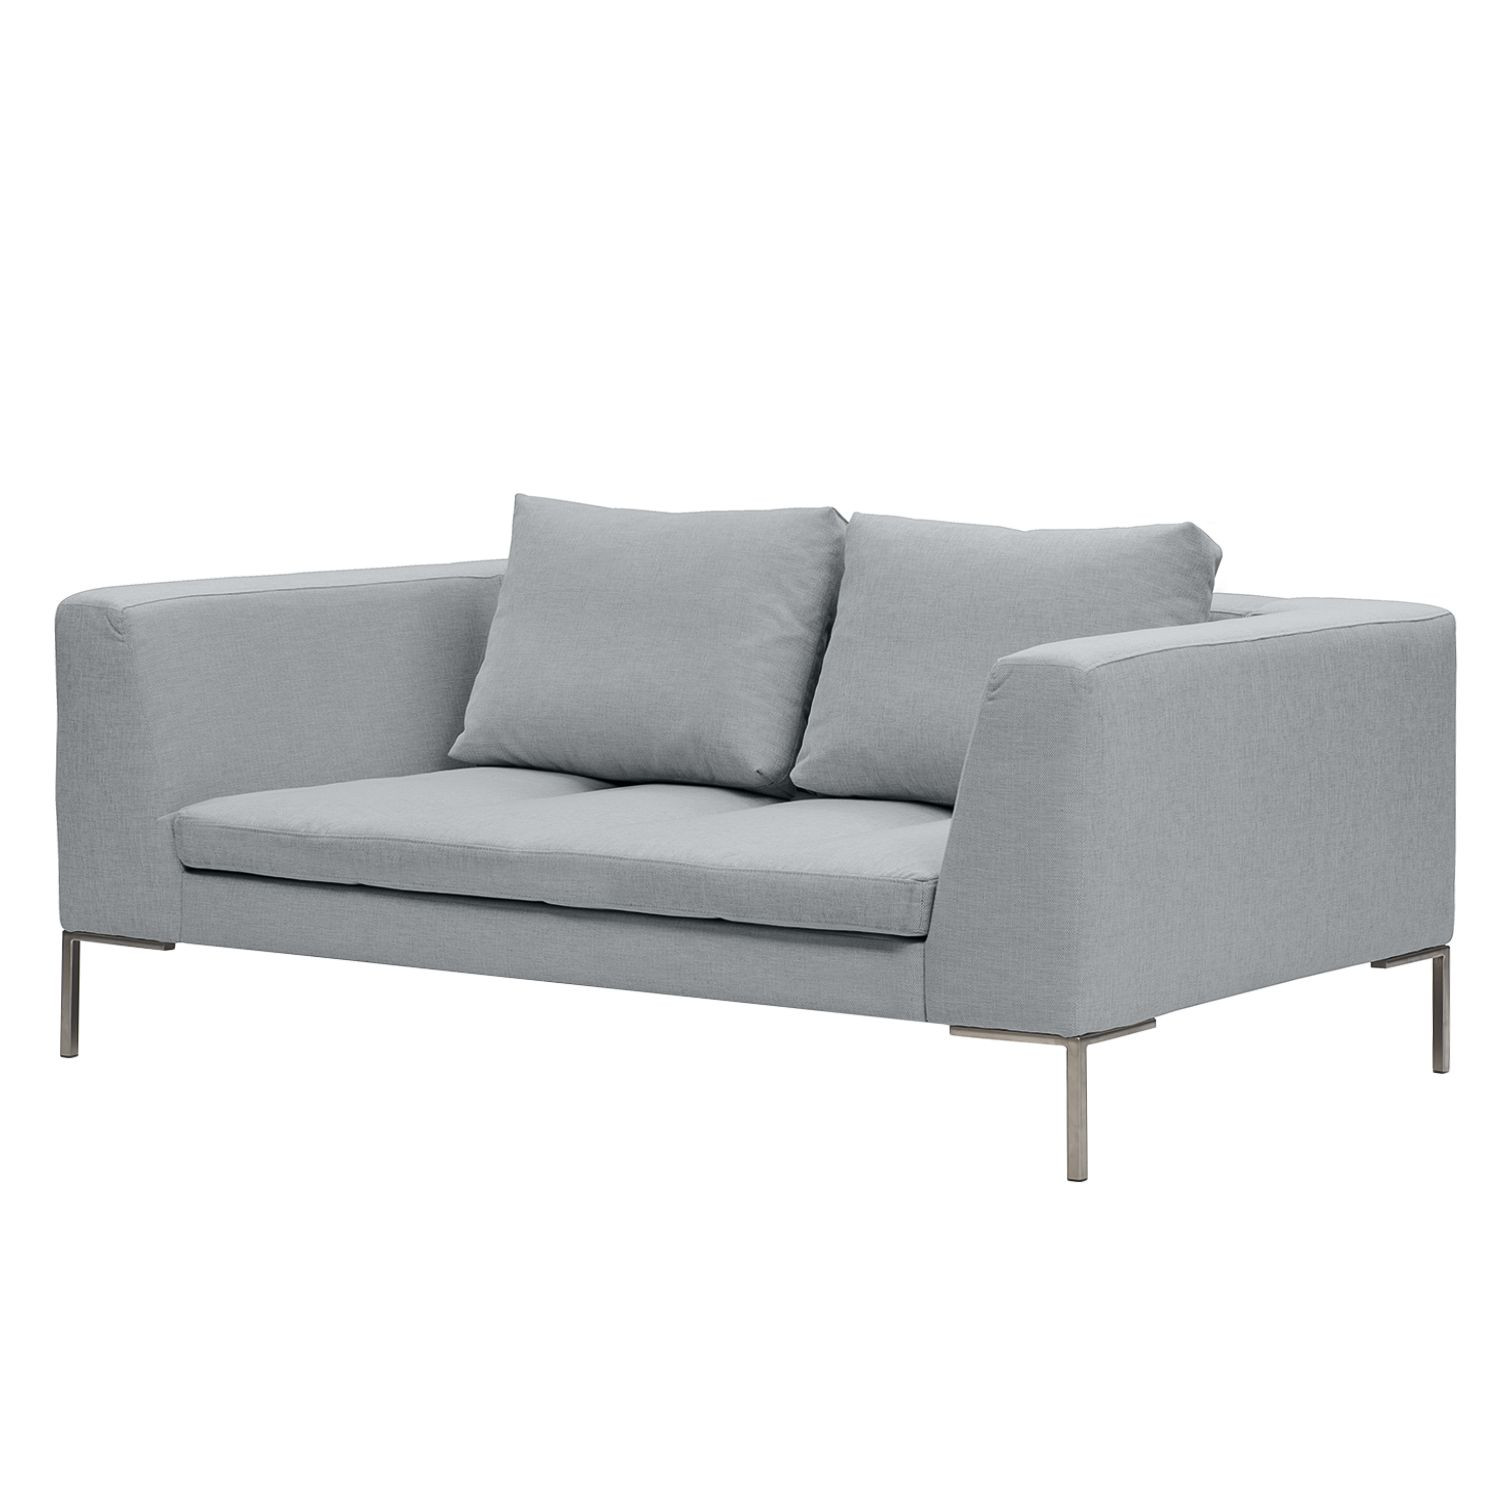 Sofa Madison (2-Sitzer) Webstoff - Stoff Anda II Silber